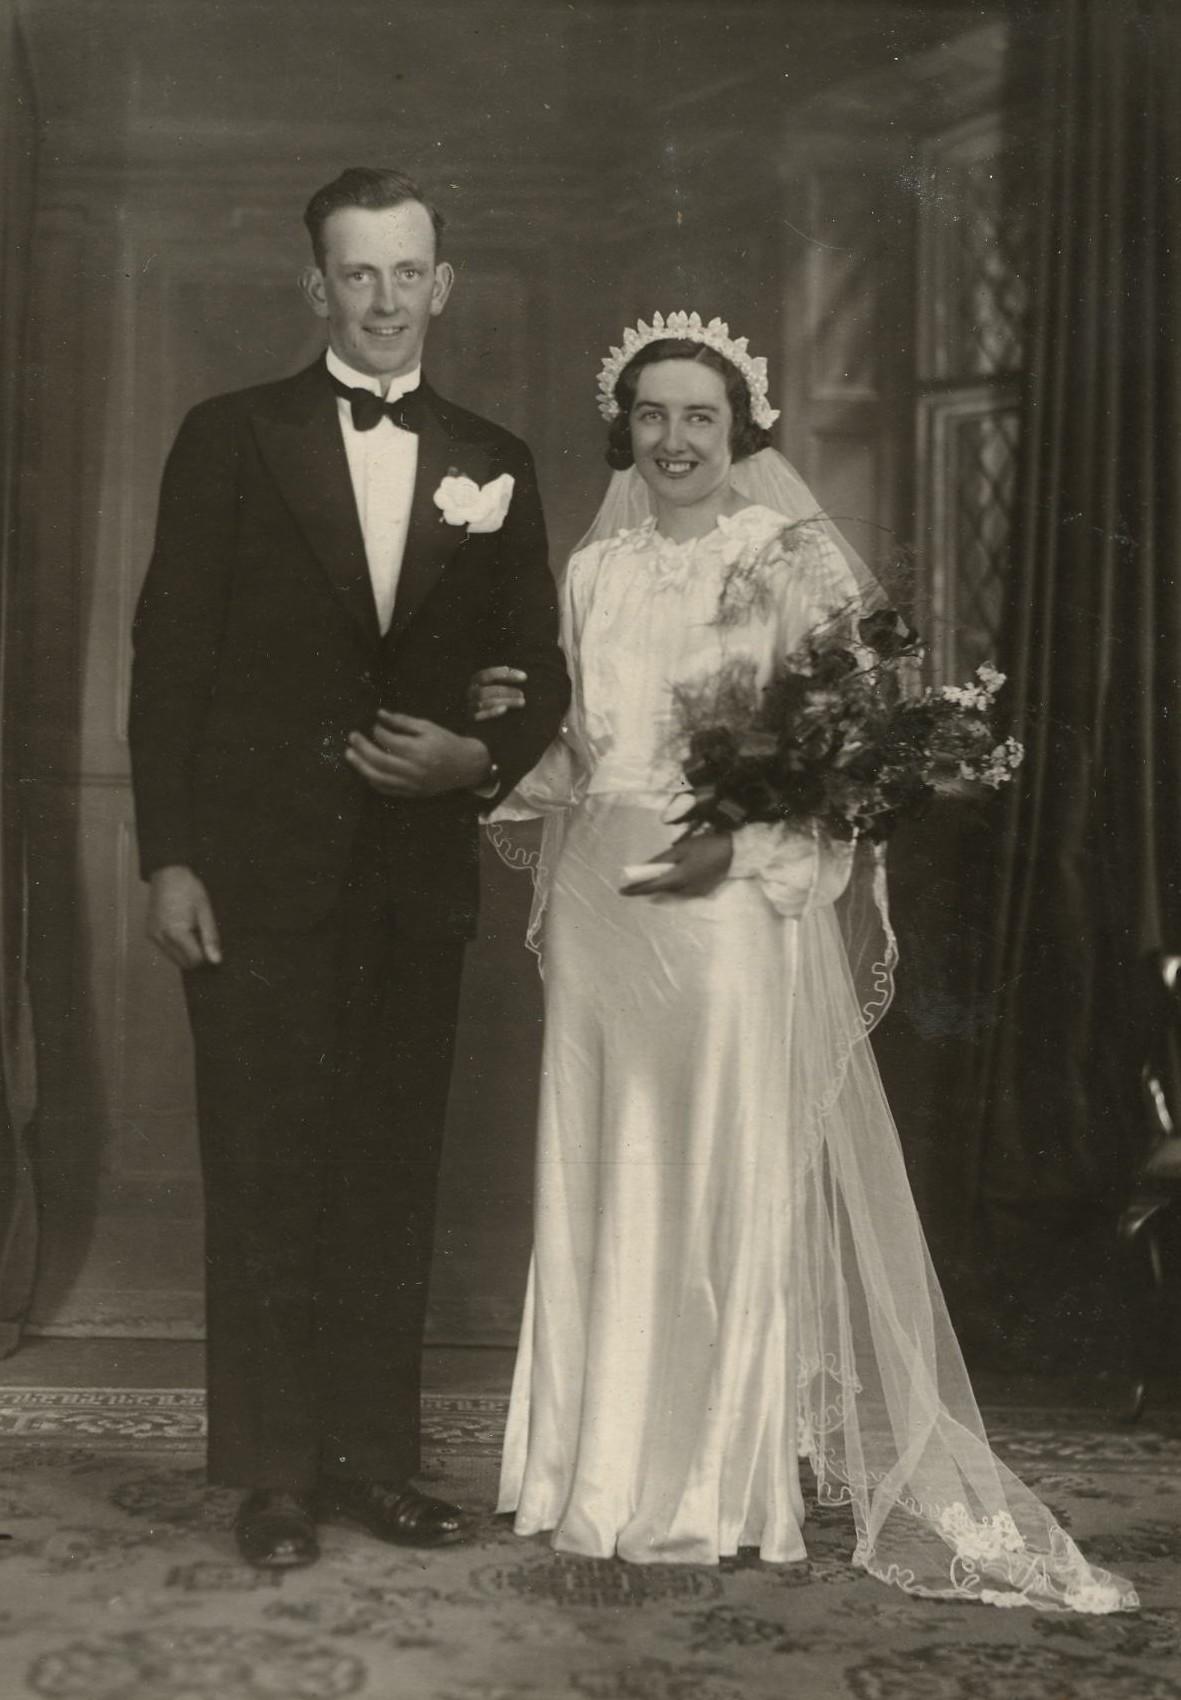 Jimmy Waddell & Jessie Cameron's Wedding